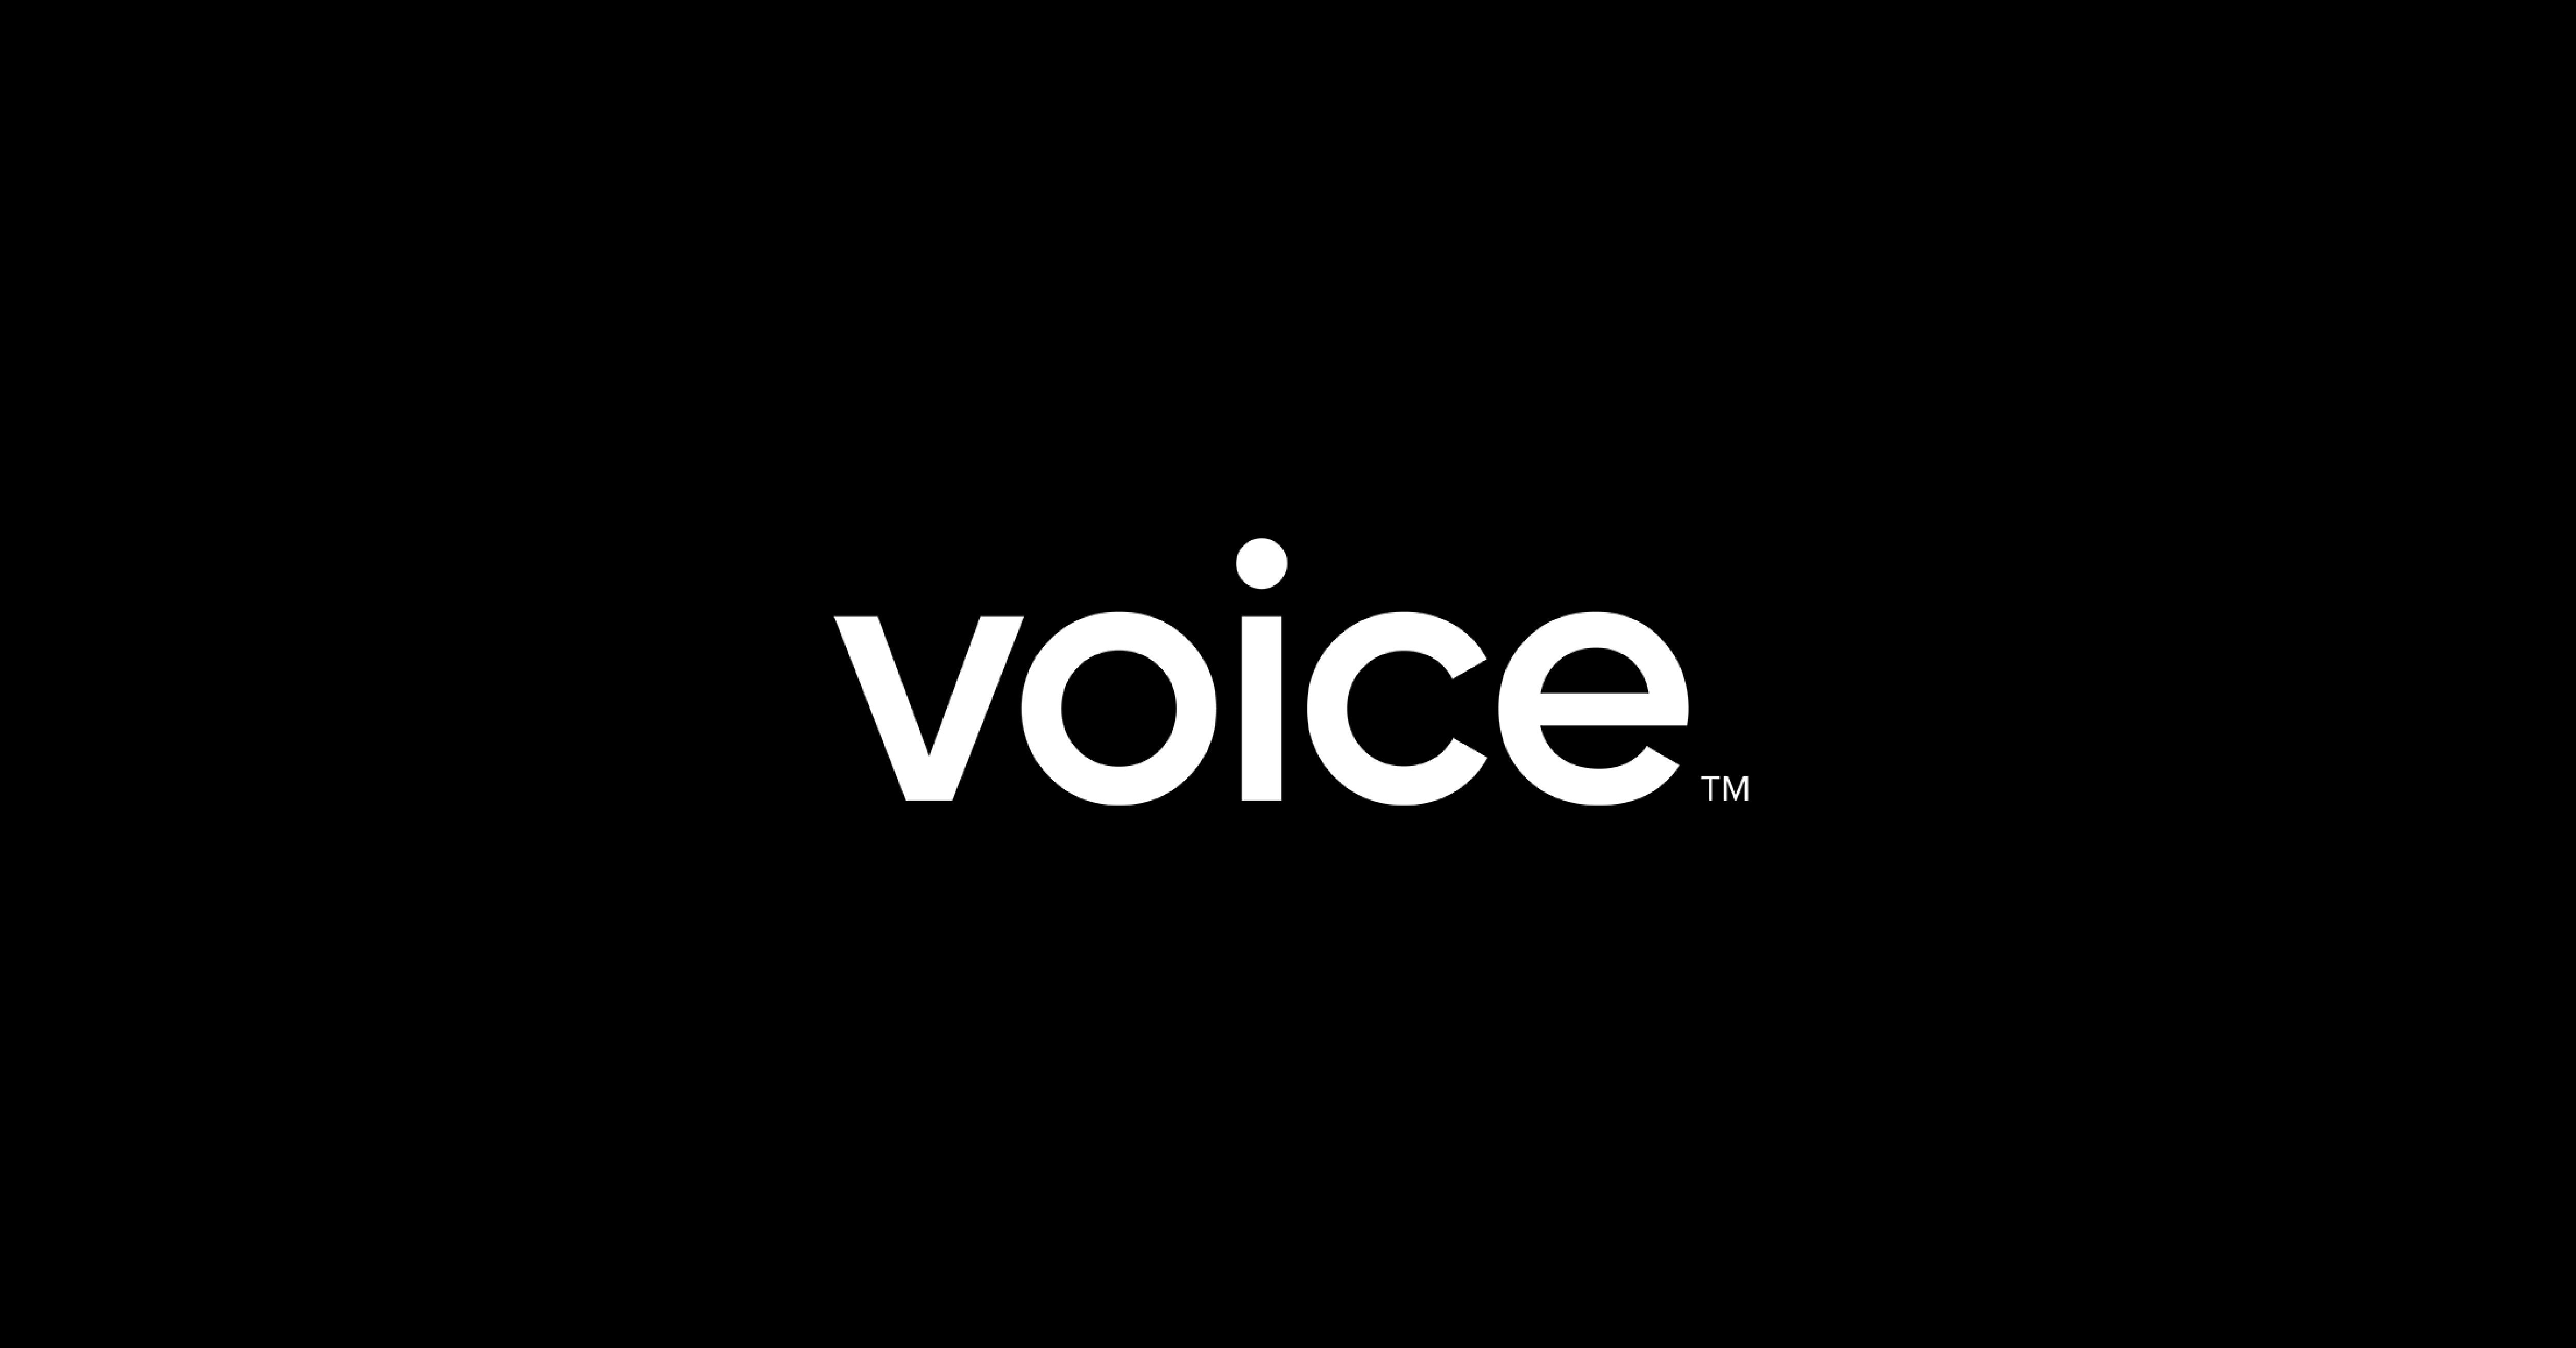 www.voice.com